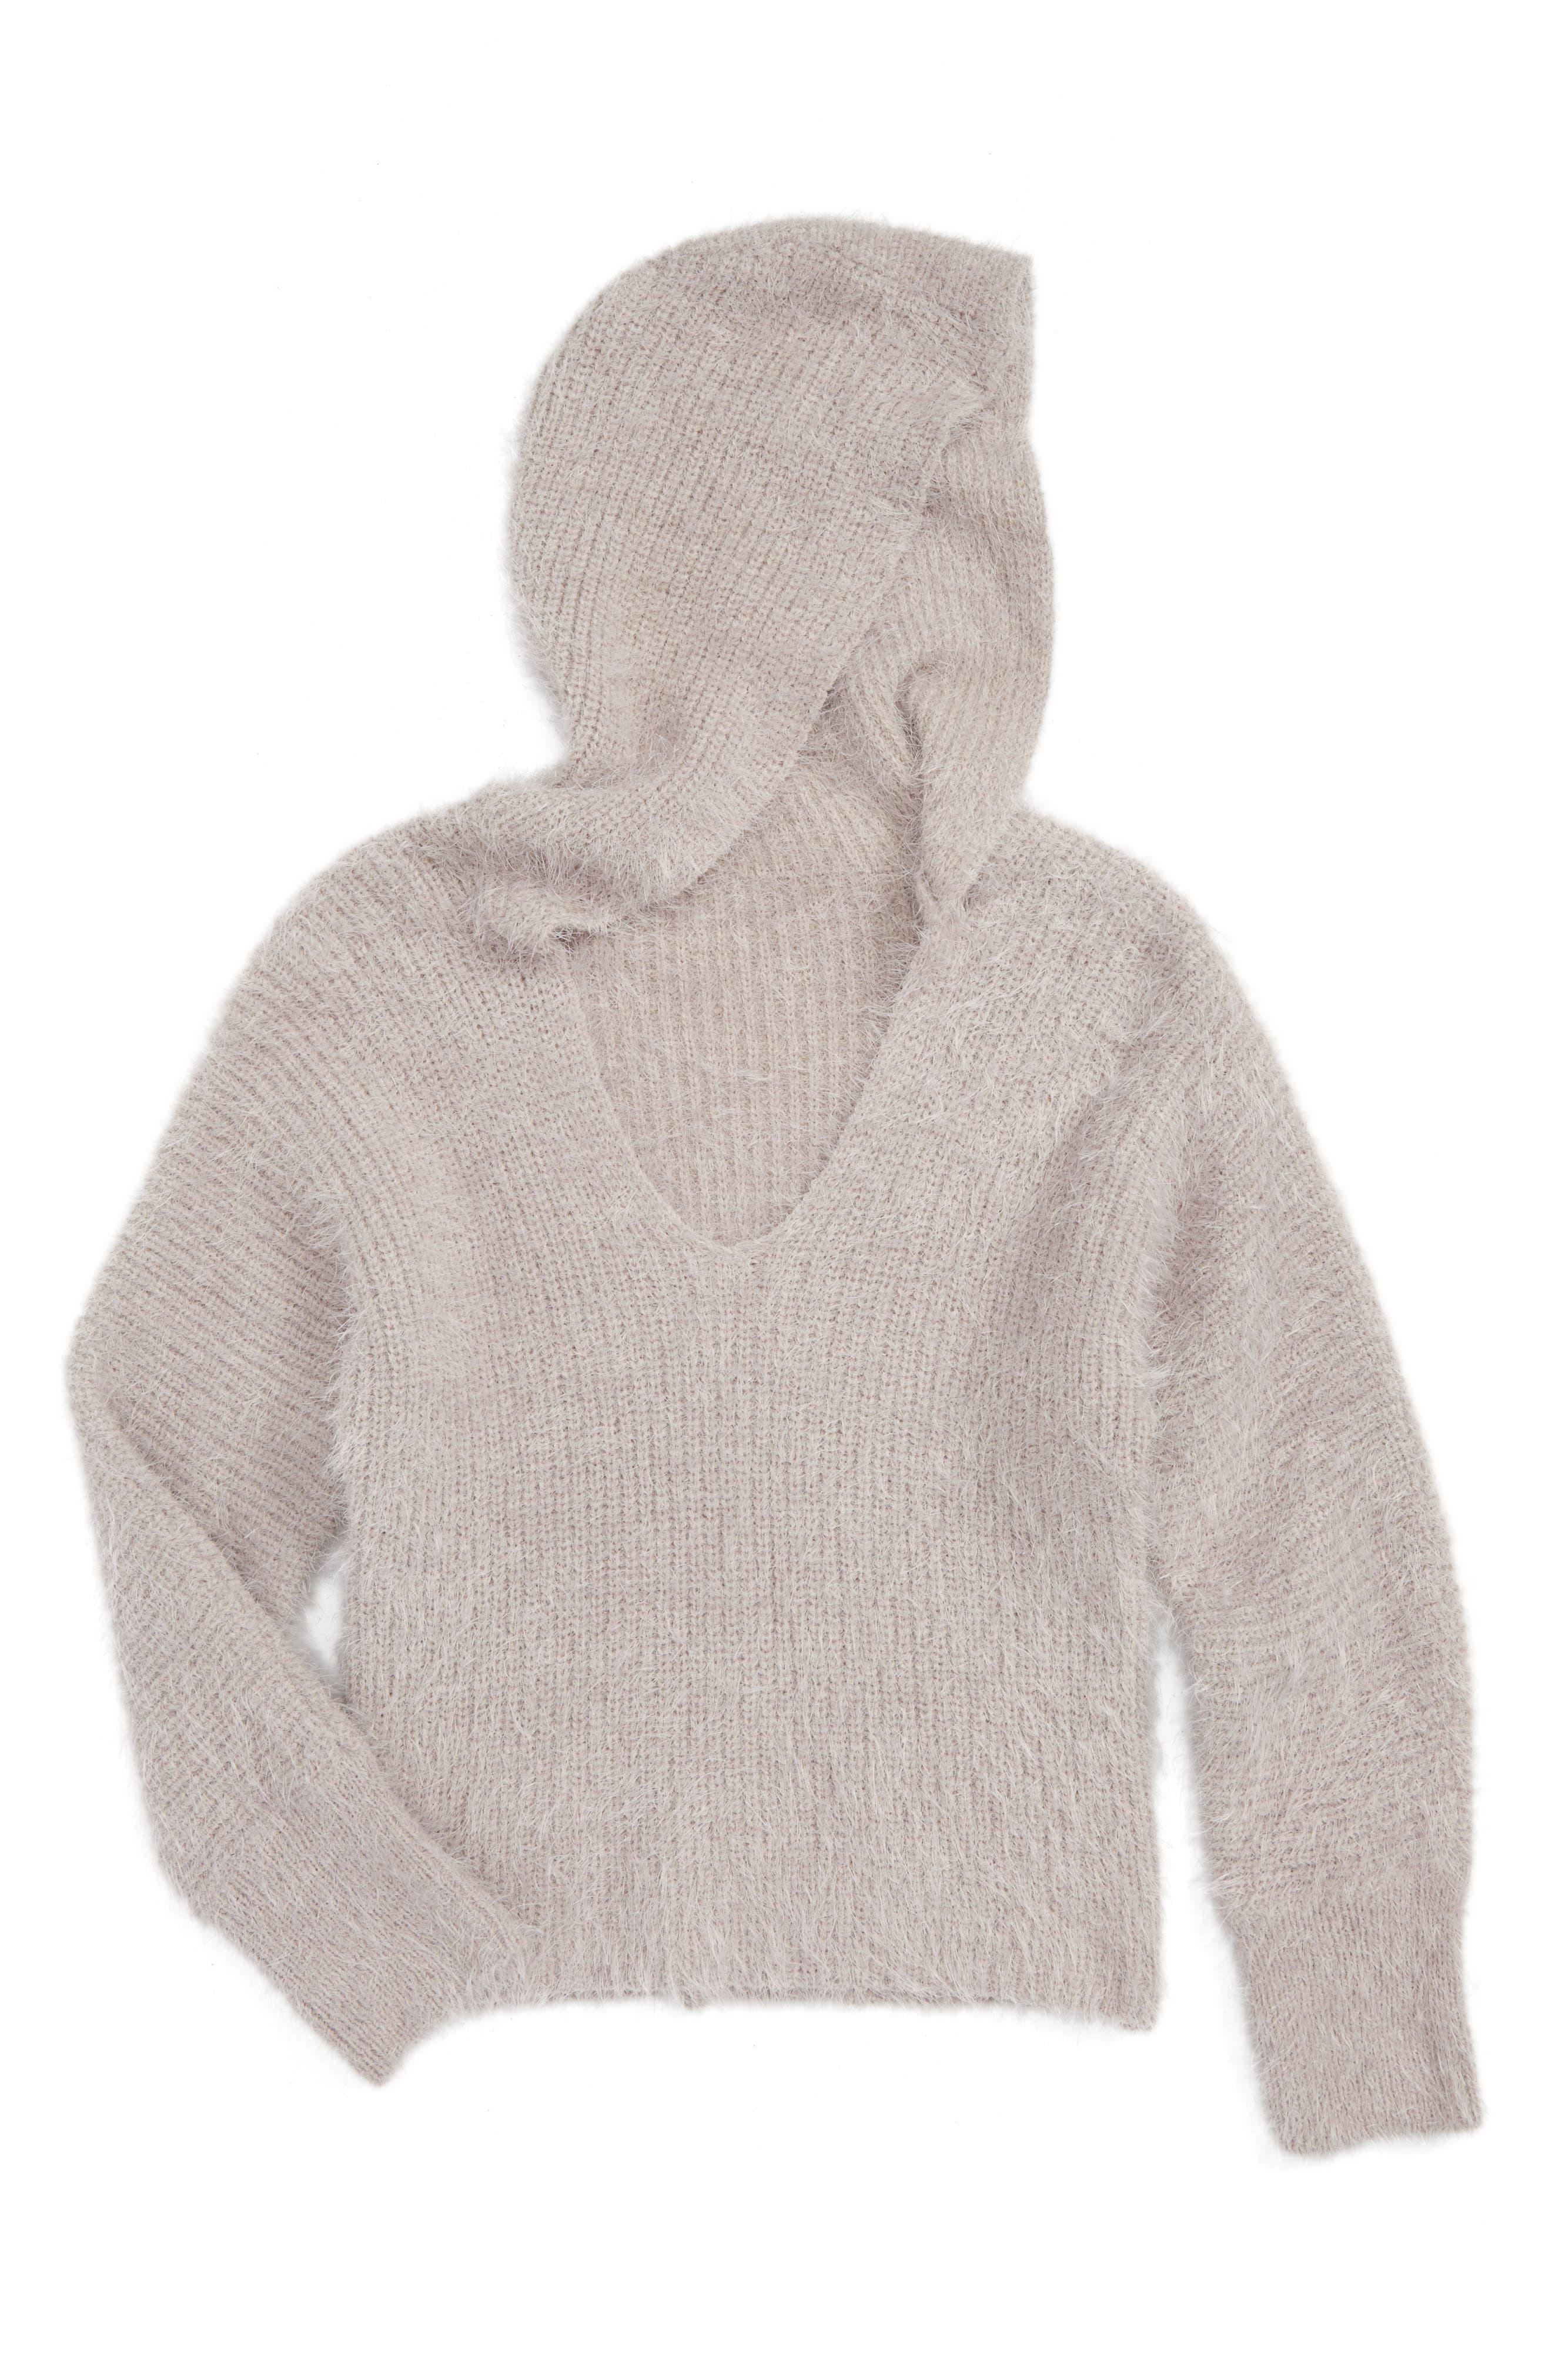 Woven Heart Hooded Sweater (Big Girls)